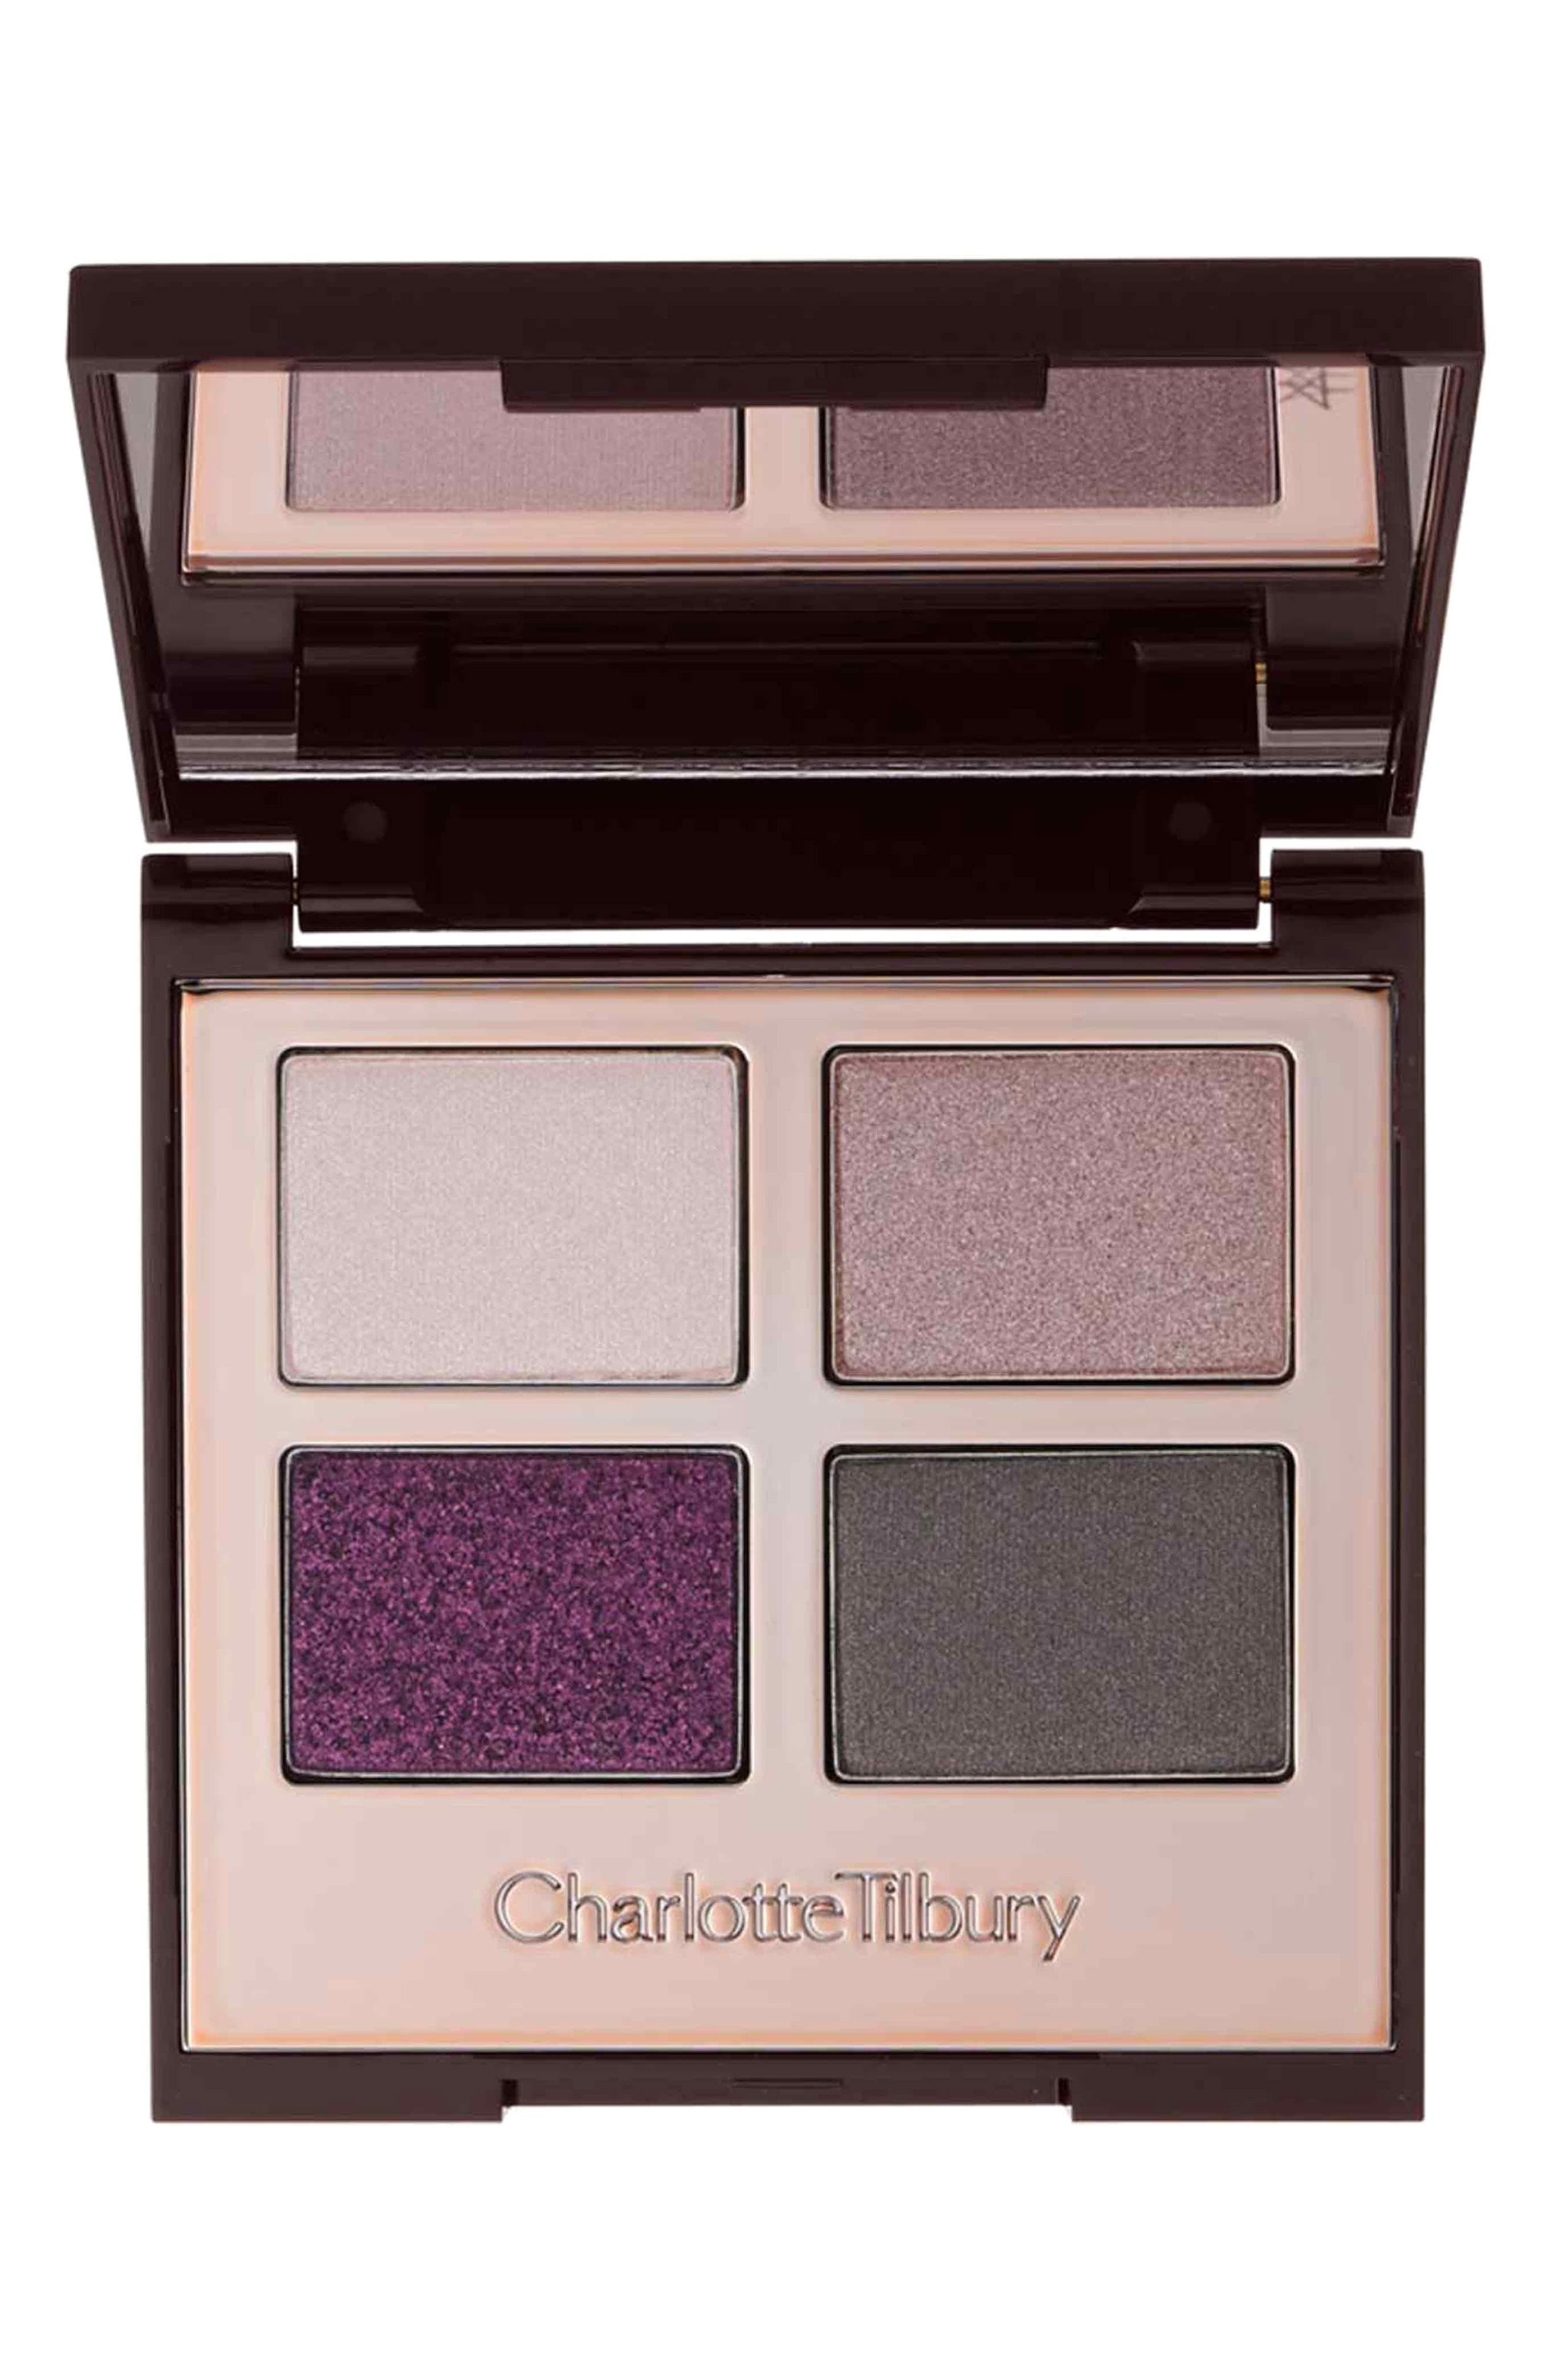 How to do Vintage Style Makeup : 1920s, 1930s, 1940s, 1950s Charlotte Tilbury Luxury Eyeshadow Palette - The Golden Goddess $53.00 AT vintagedancer.com